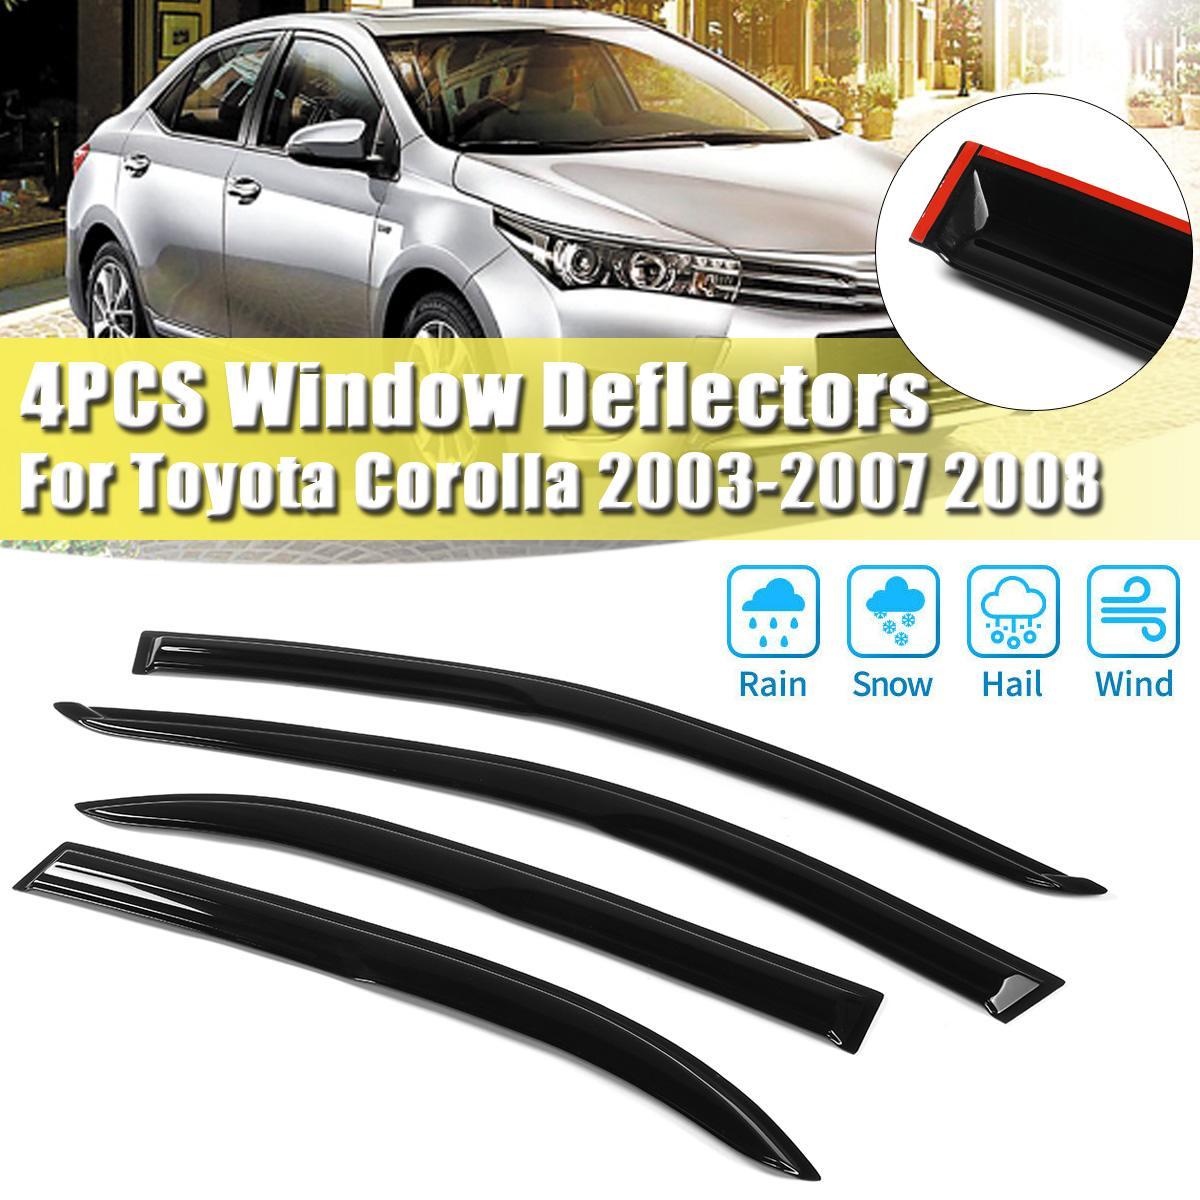 Car Window Rain Shield Visor Guards Protector Sun Wind Deflector Awning Shade Cover for toyota Corolla 2003-2008 Car Accessories